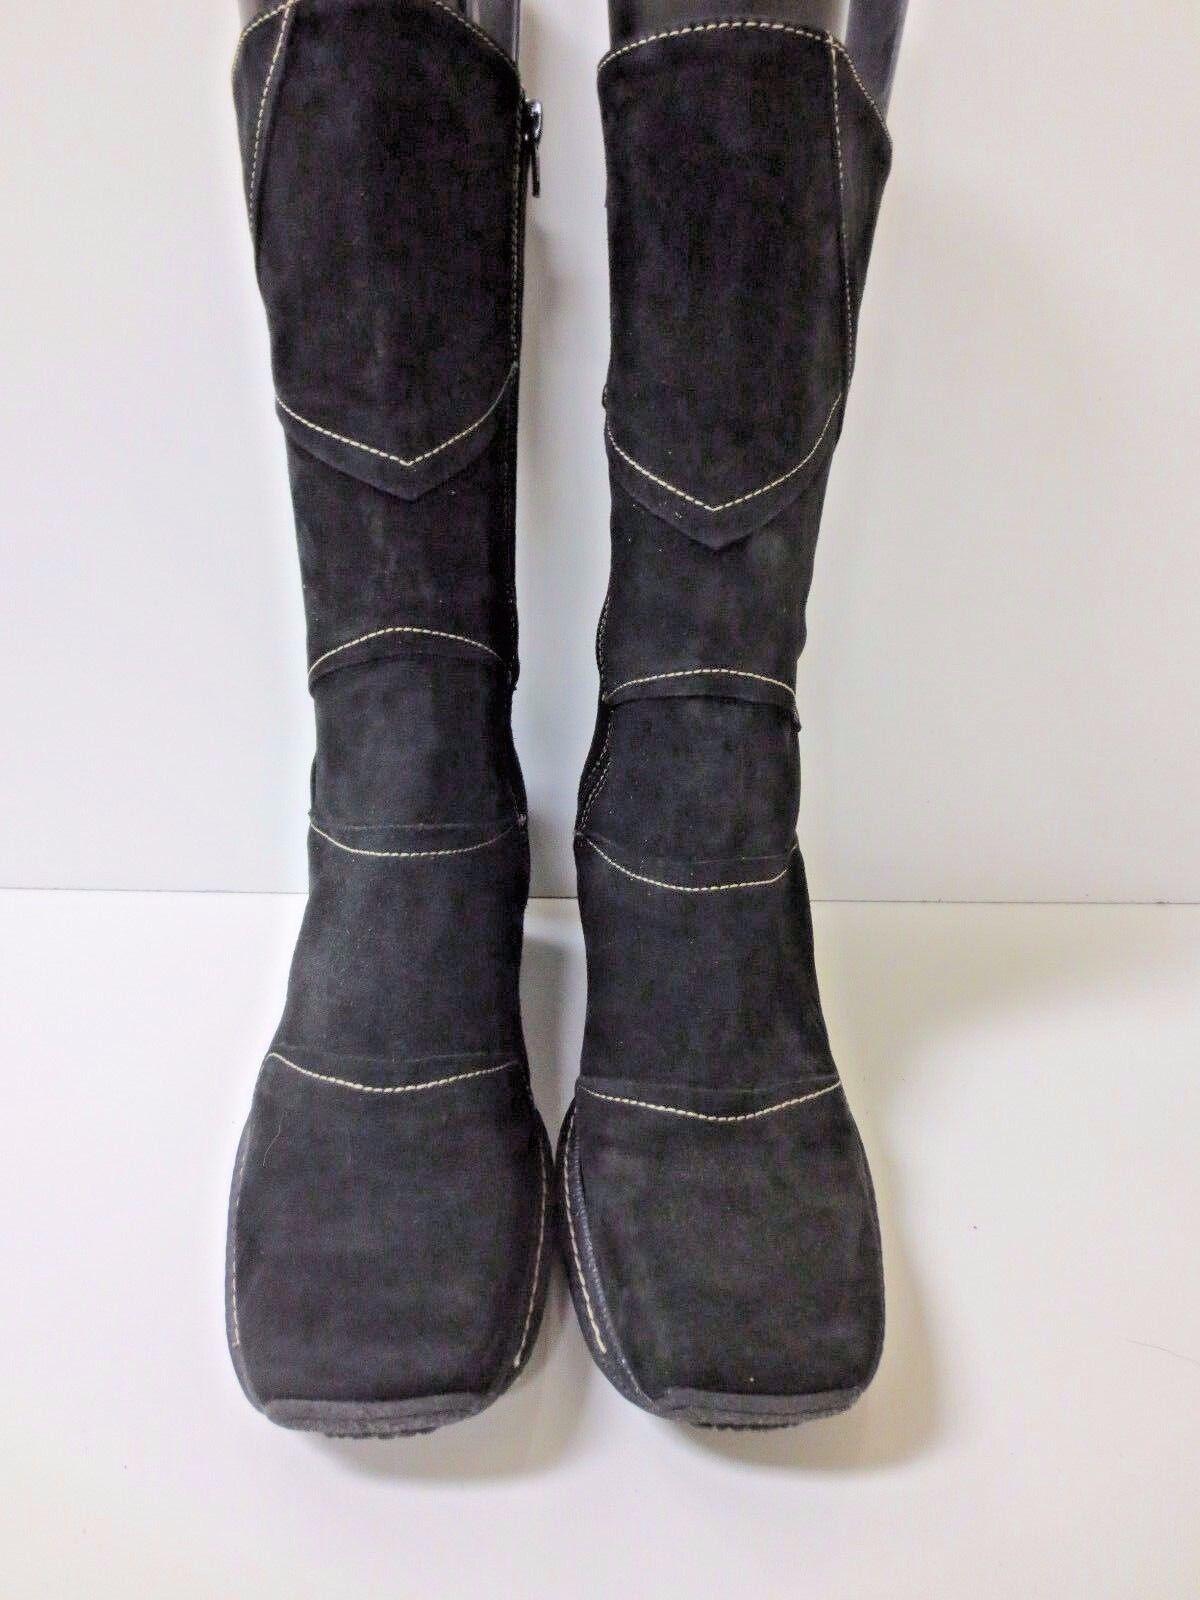 Cordani Pristine botas - Mujer 's size: 7.5 7.5 size: / UE: 39,5, Black Suede f82fa4